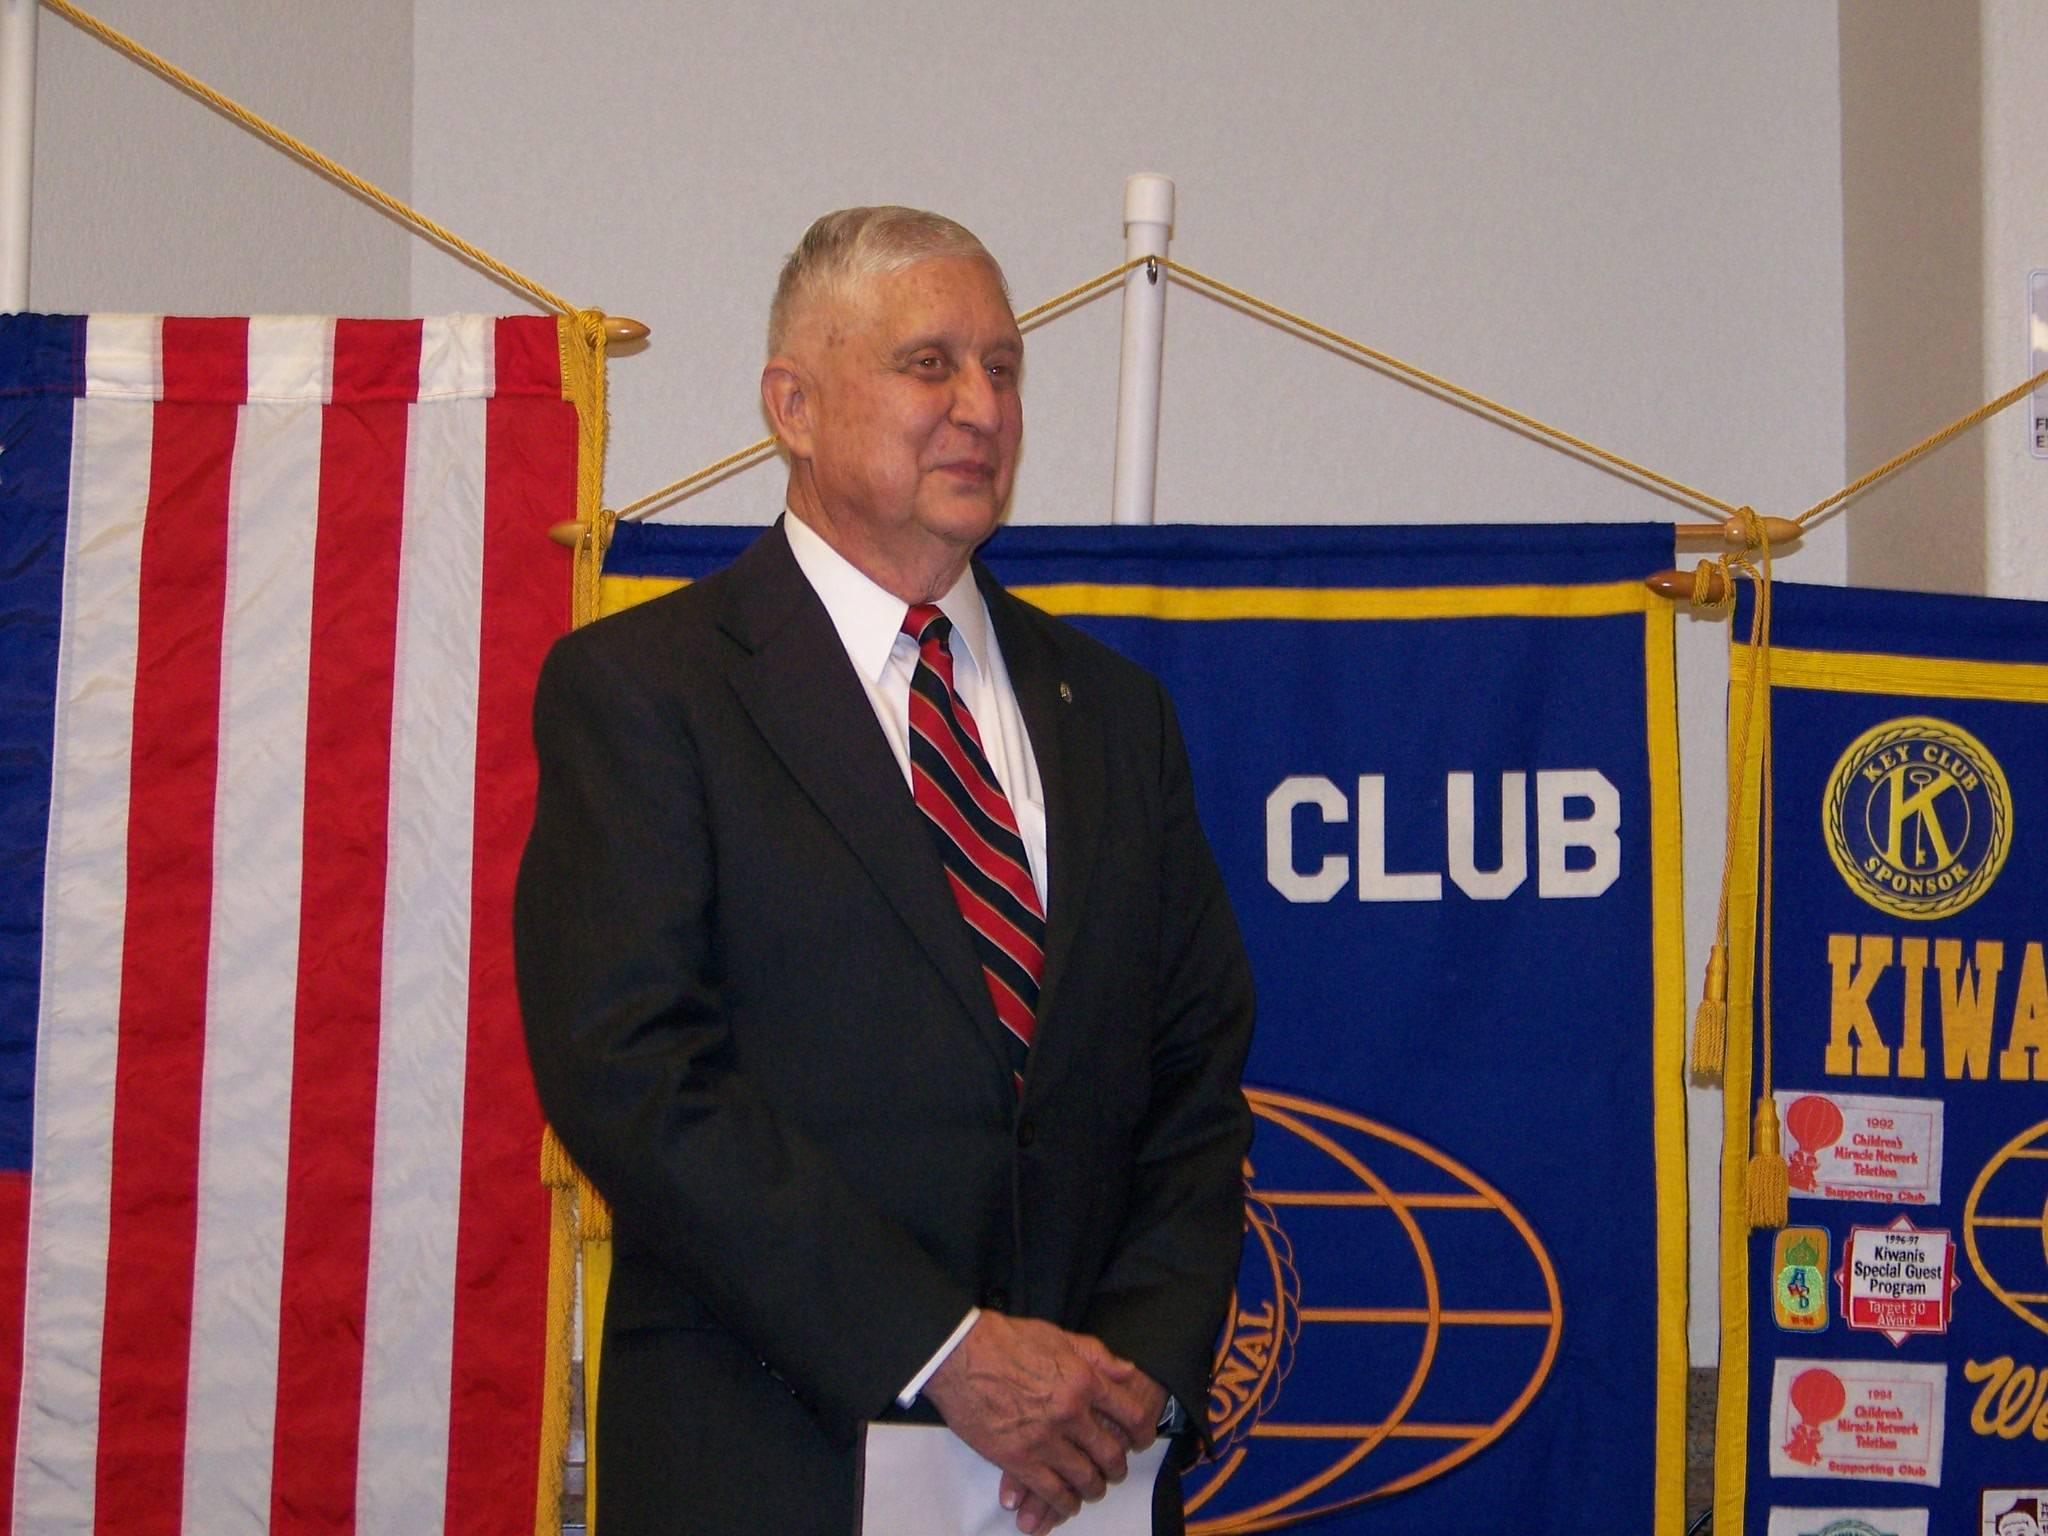 2015-16 President Charles Sweeney